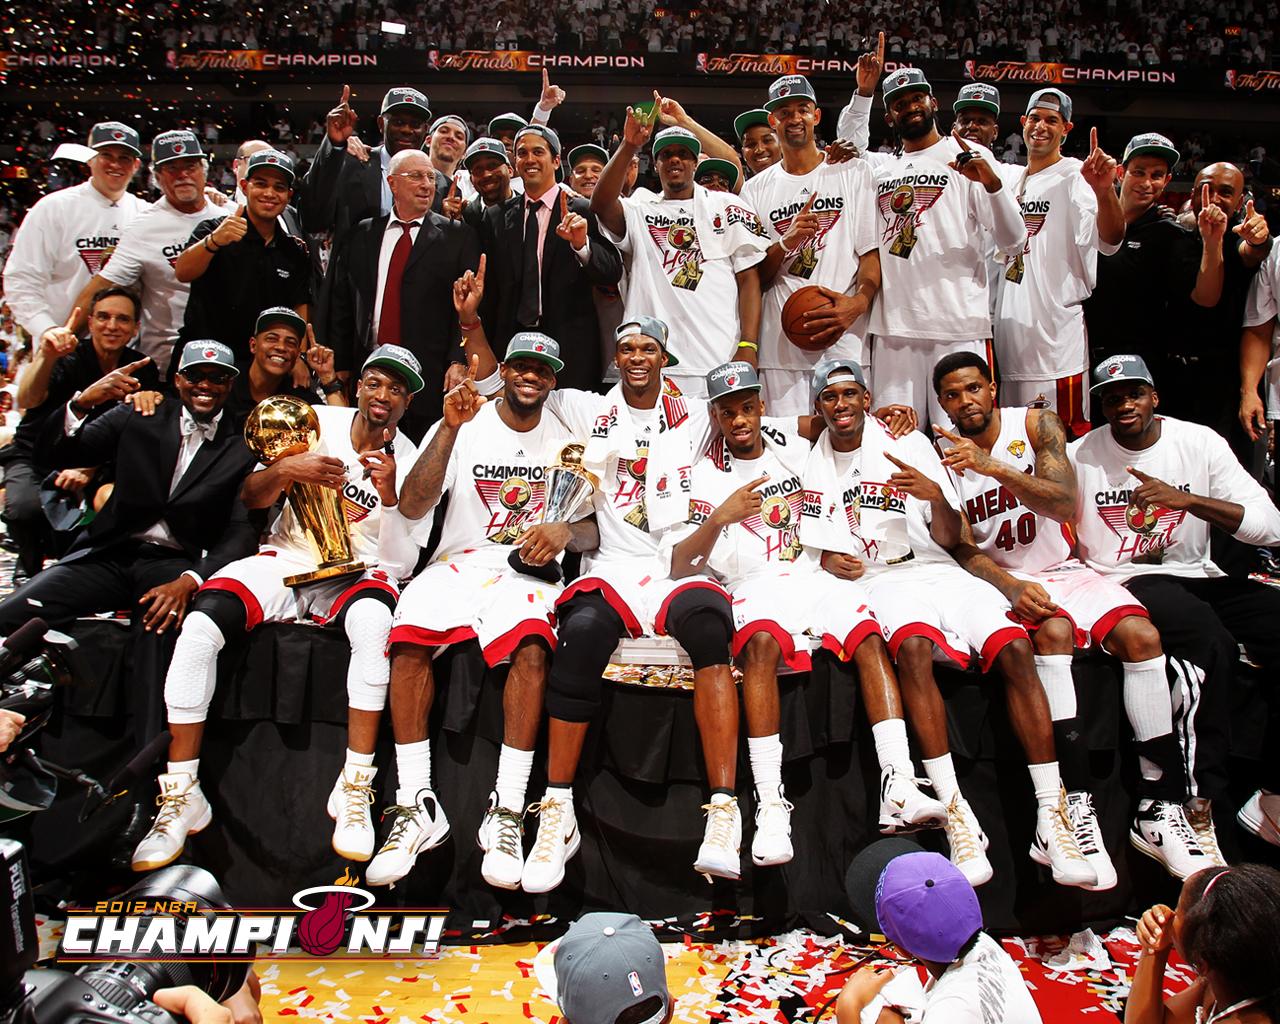 Nba Basketball Miami Heat Bedroom In: Heat Champions